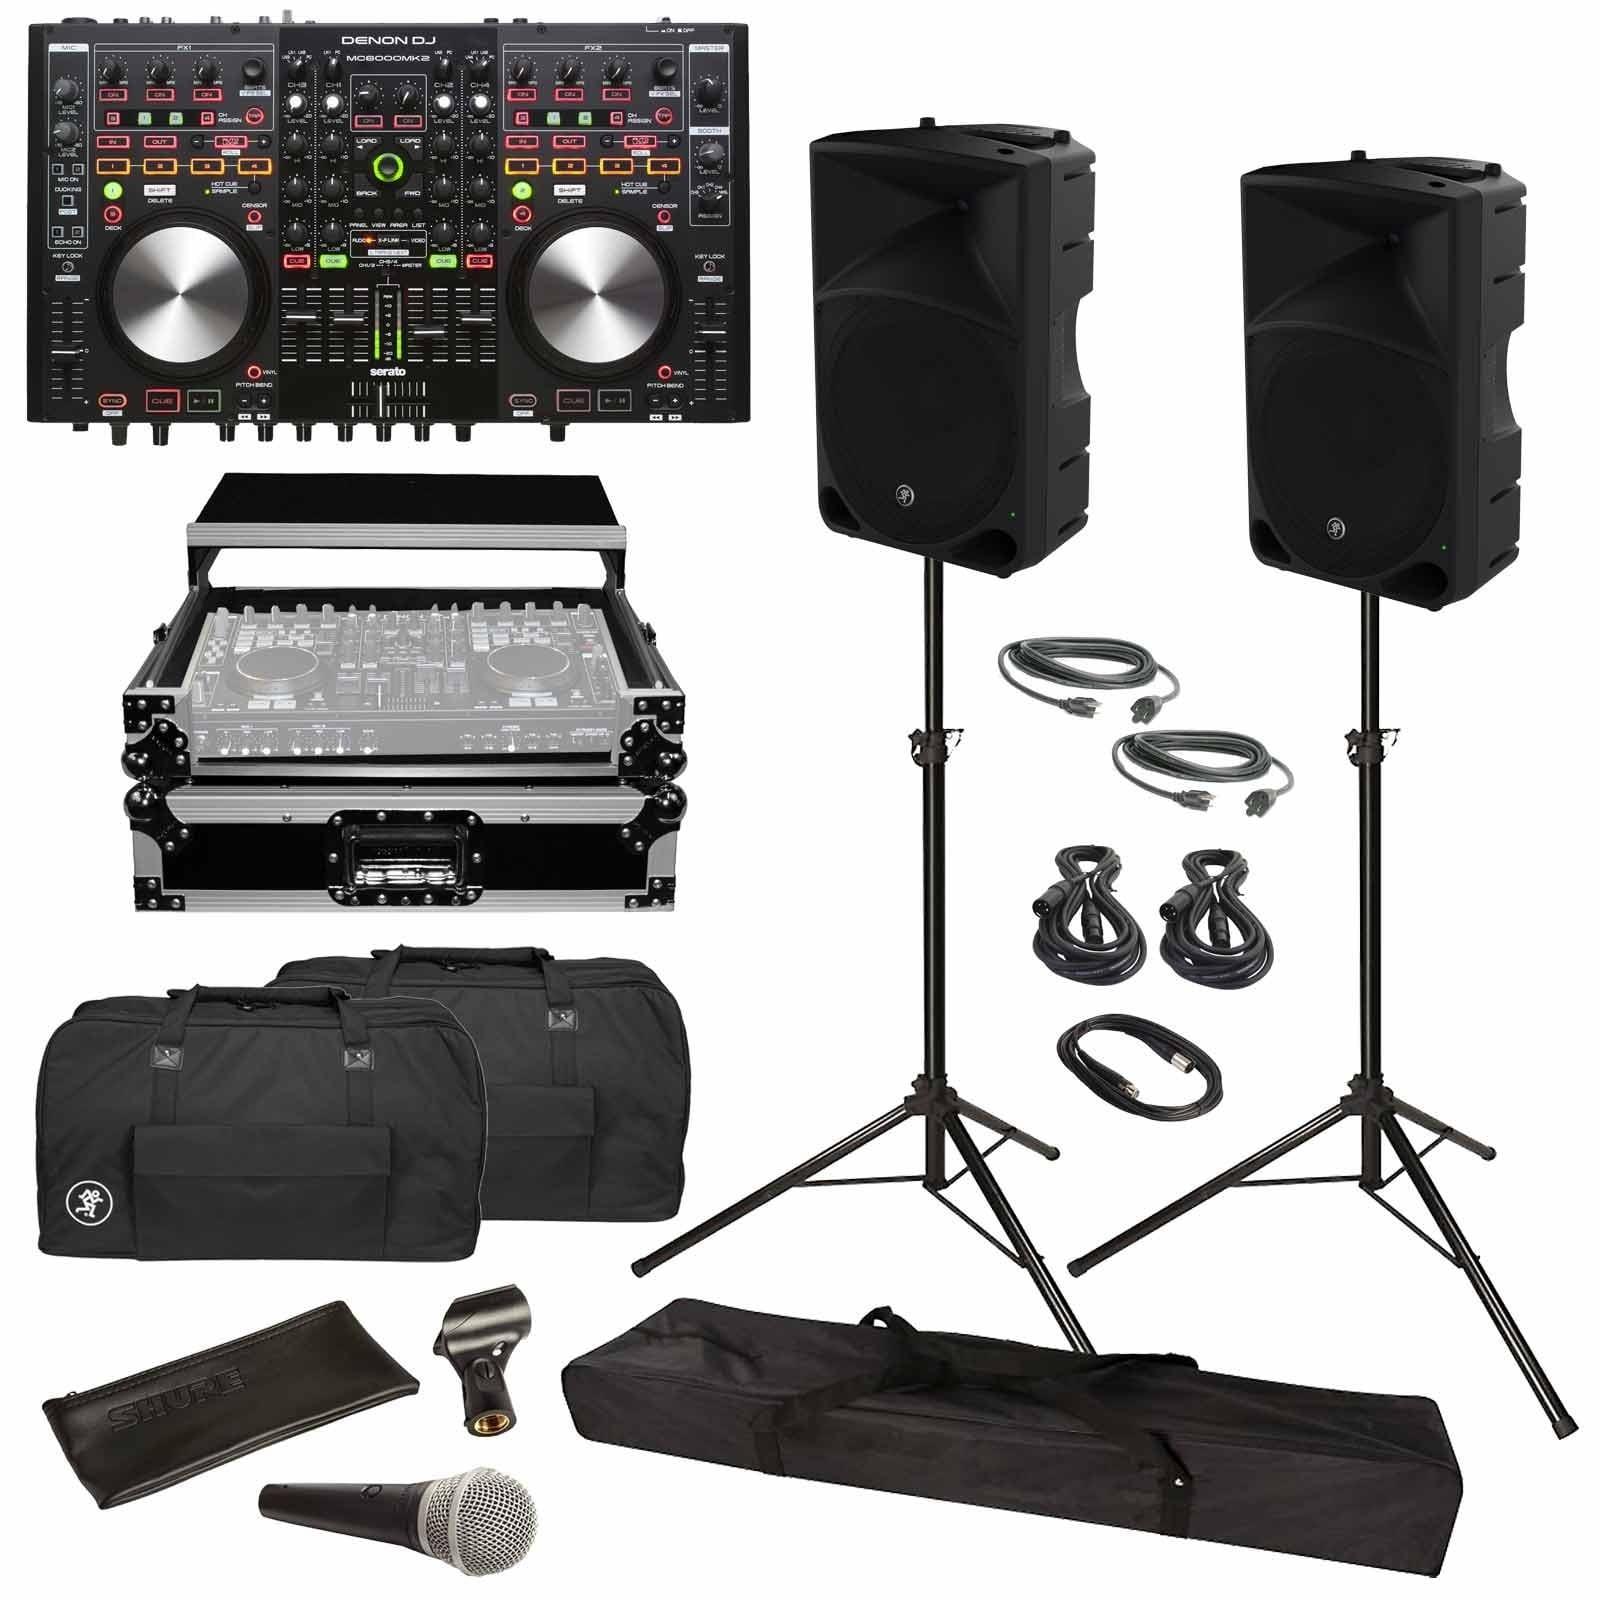 denon-dj-mc6000mk2-professional-digital-mixer-controller-pro-dj-package-902